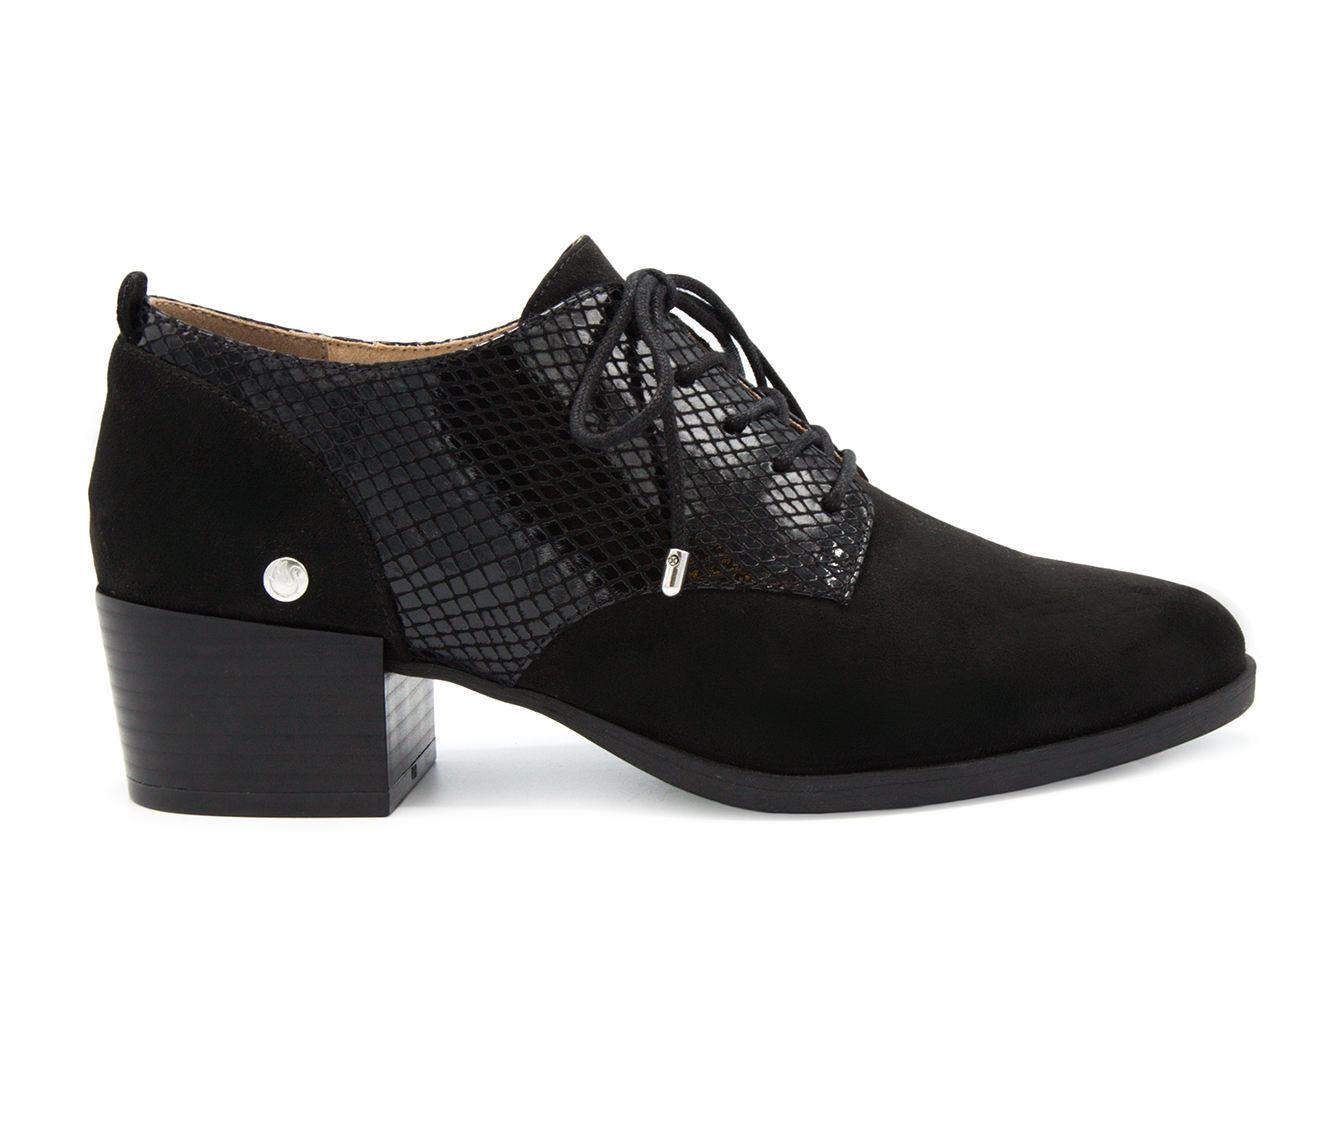 buy new series Women's Gloria Vanderbilt Quinn Shoes Black